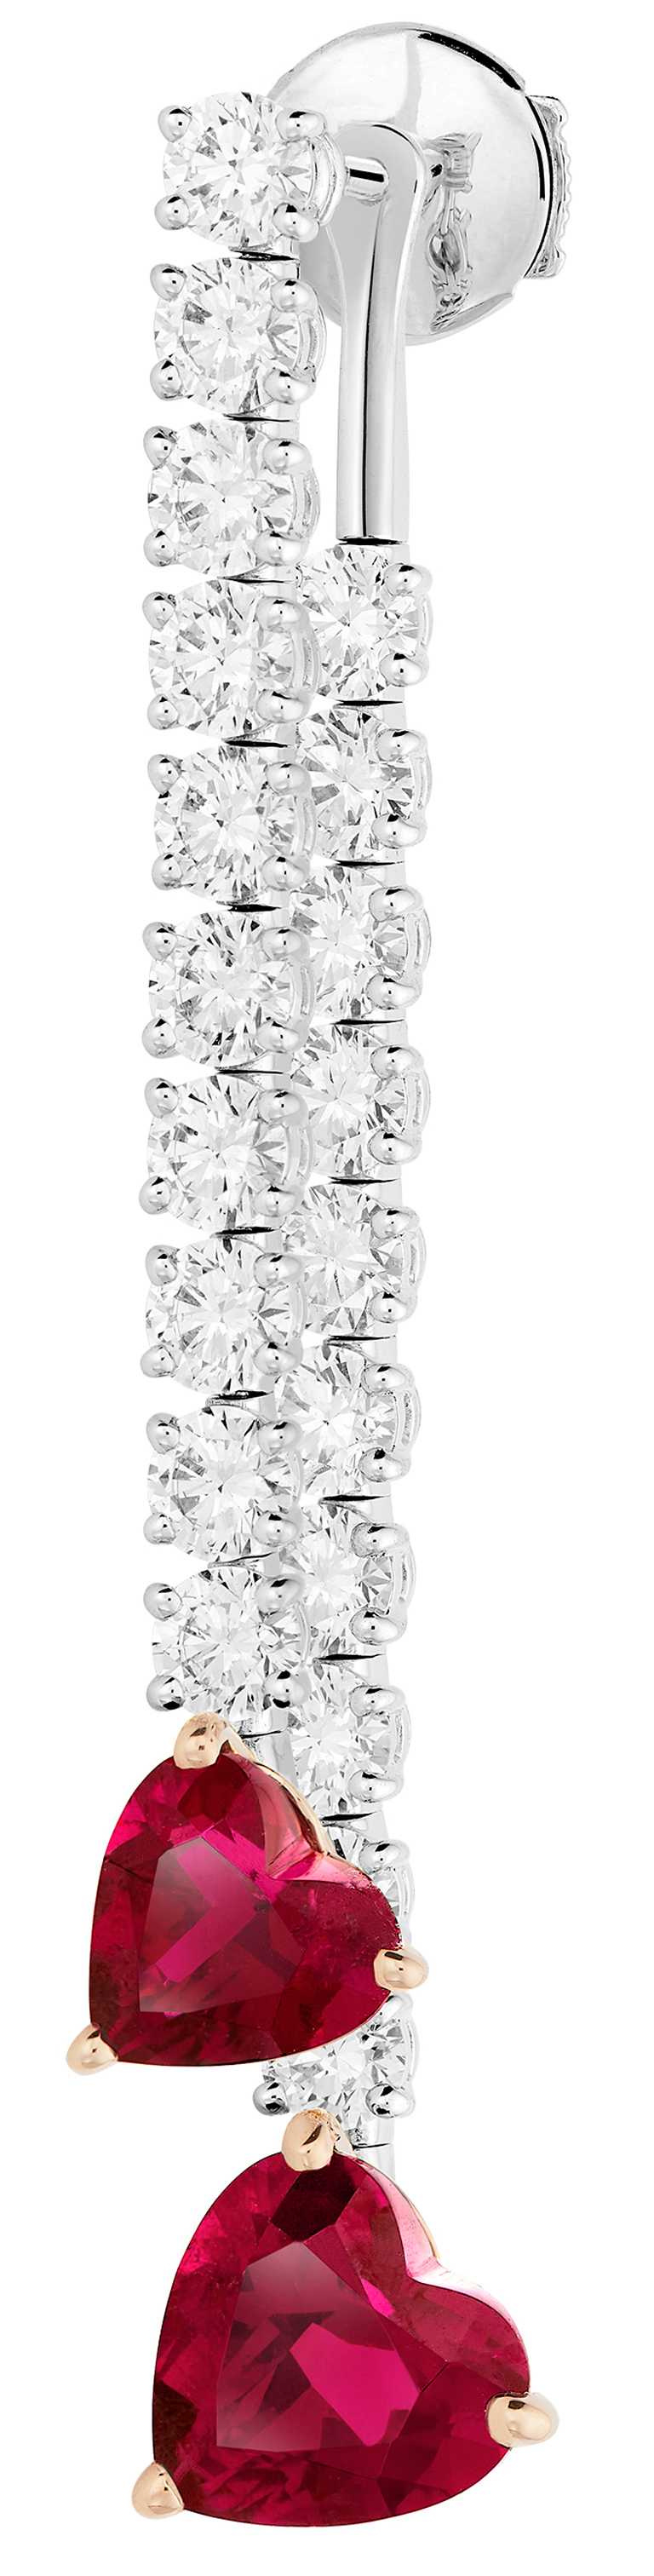 FRED「Pretty Woman」高級珠寶系列,Glamorous 紅碧璽鑽石耳環╱1,096,500元。(圖╱FRED提供)